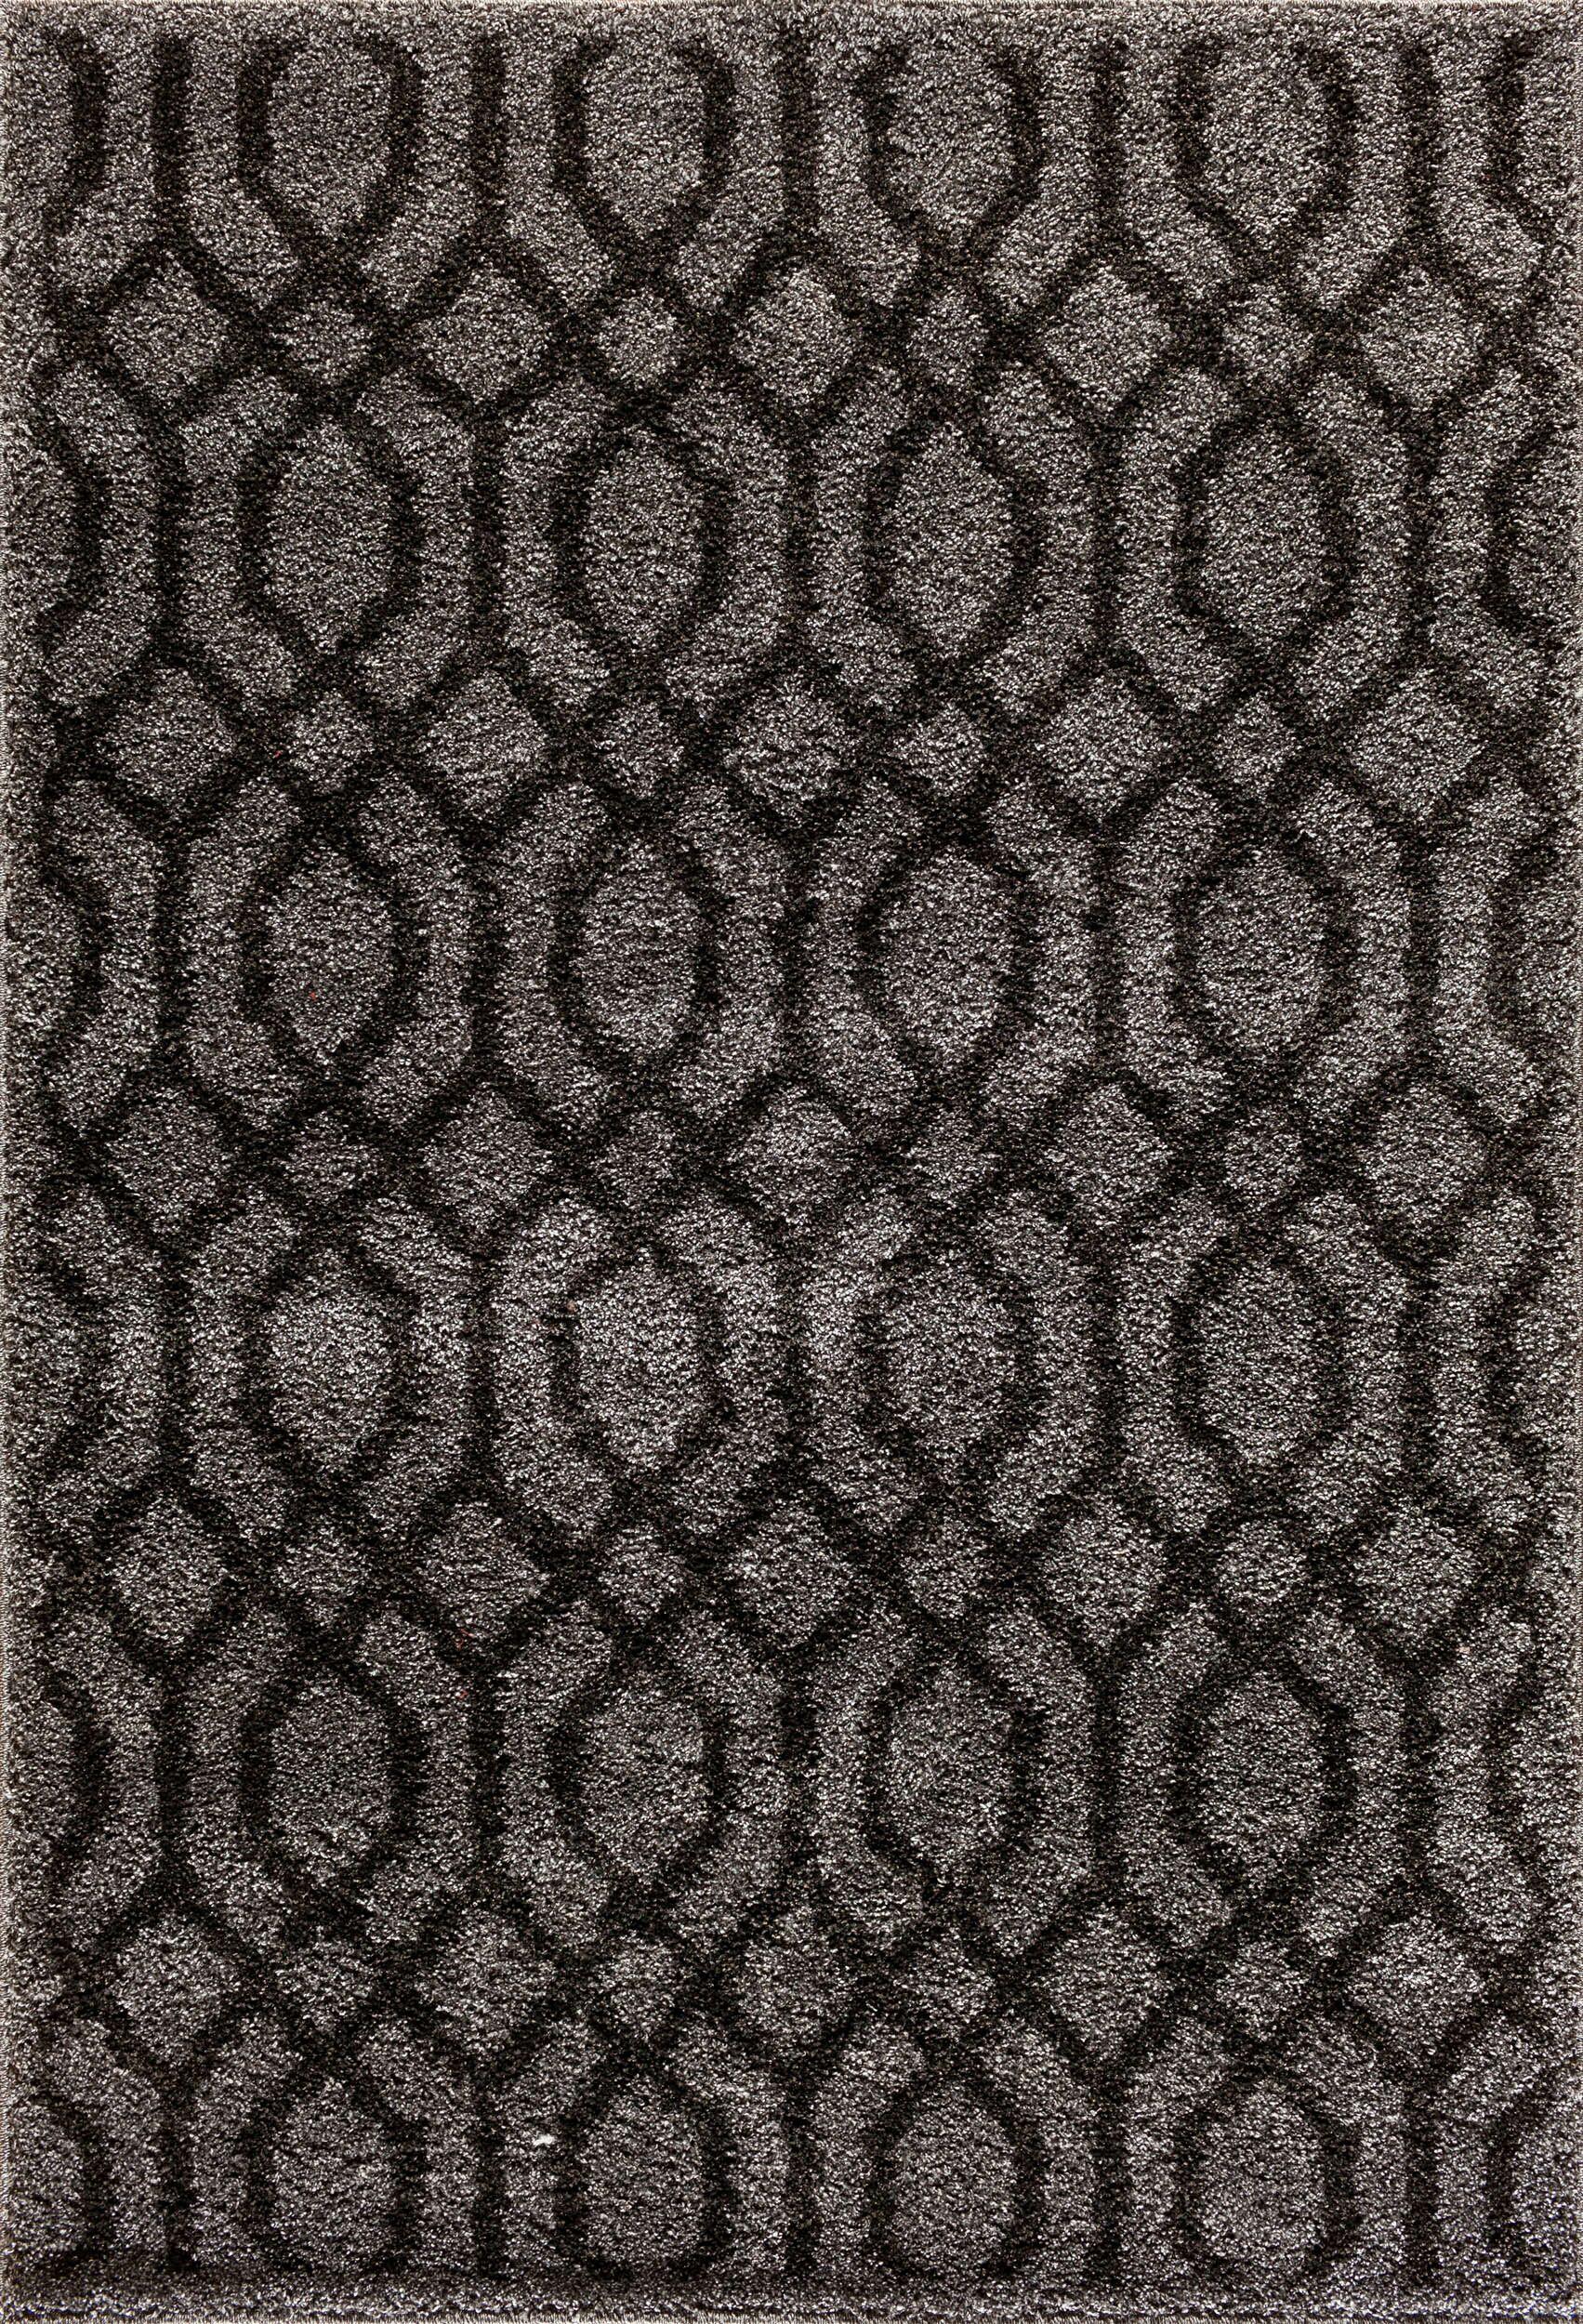 Hamilton Silver/Black Area Rug Rug Size: 7'10